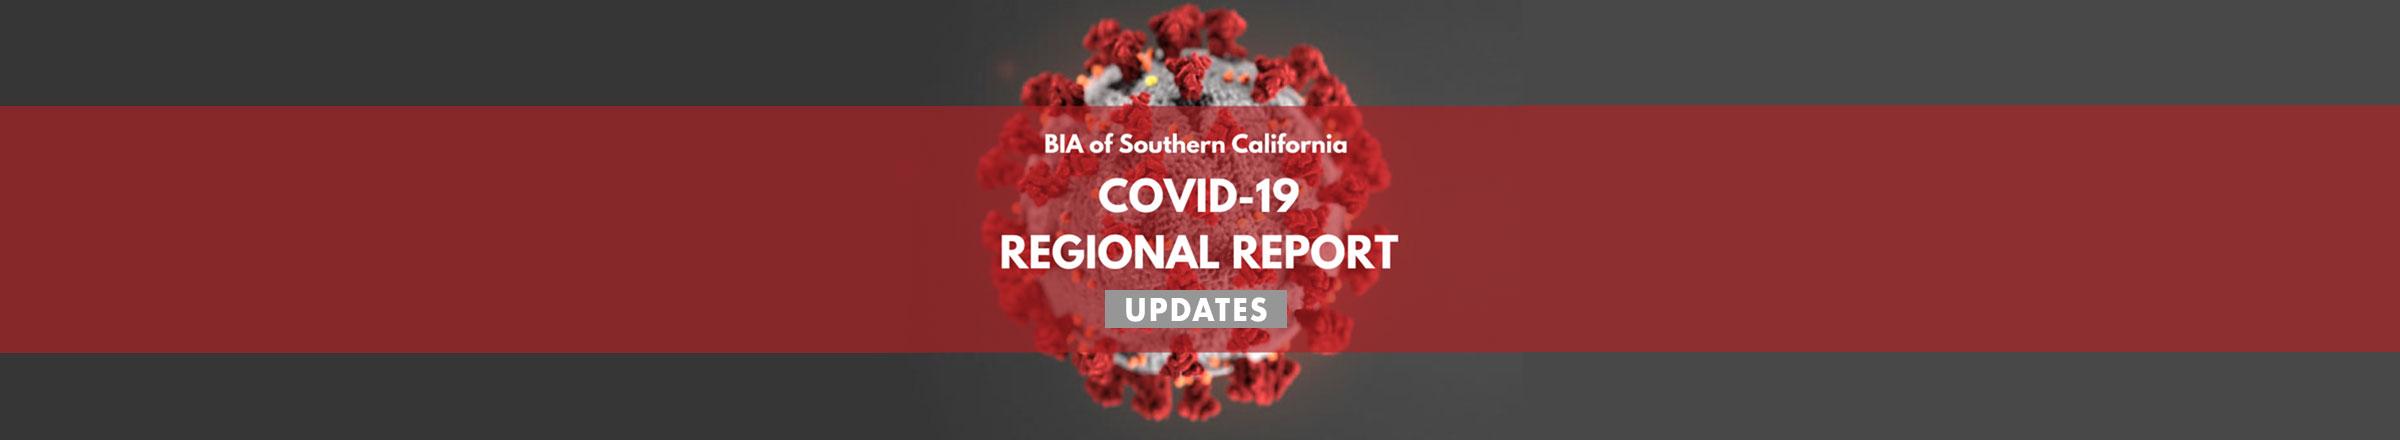 2020-04-13-BIALAV-COVID-19-Updates-2